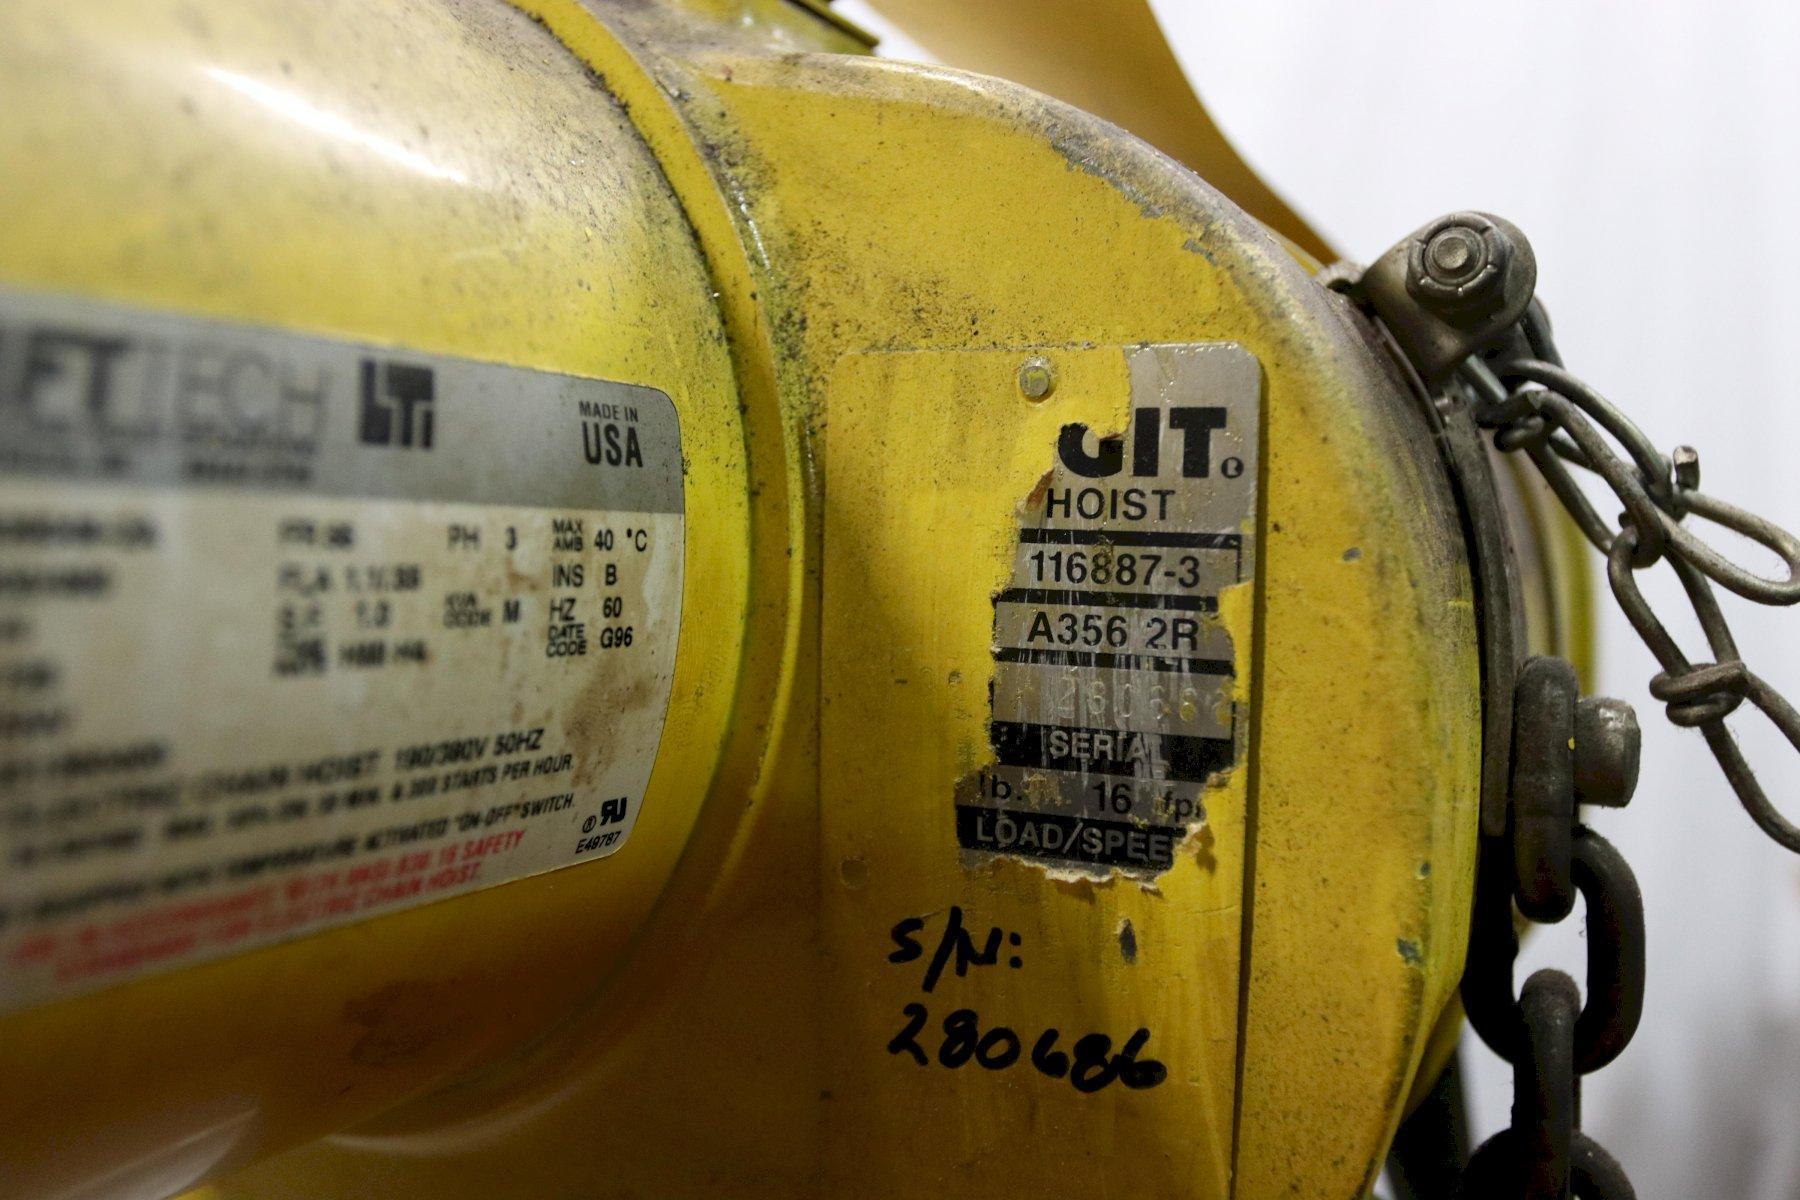 1/4 TON BUDGIT ELECTRIC POWERED CHAIN HOIST: STOCK #12000